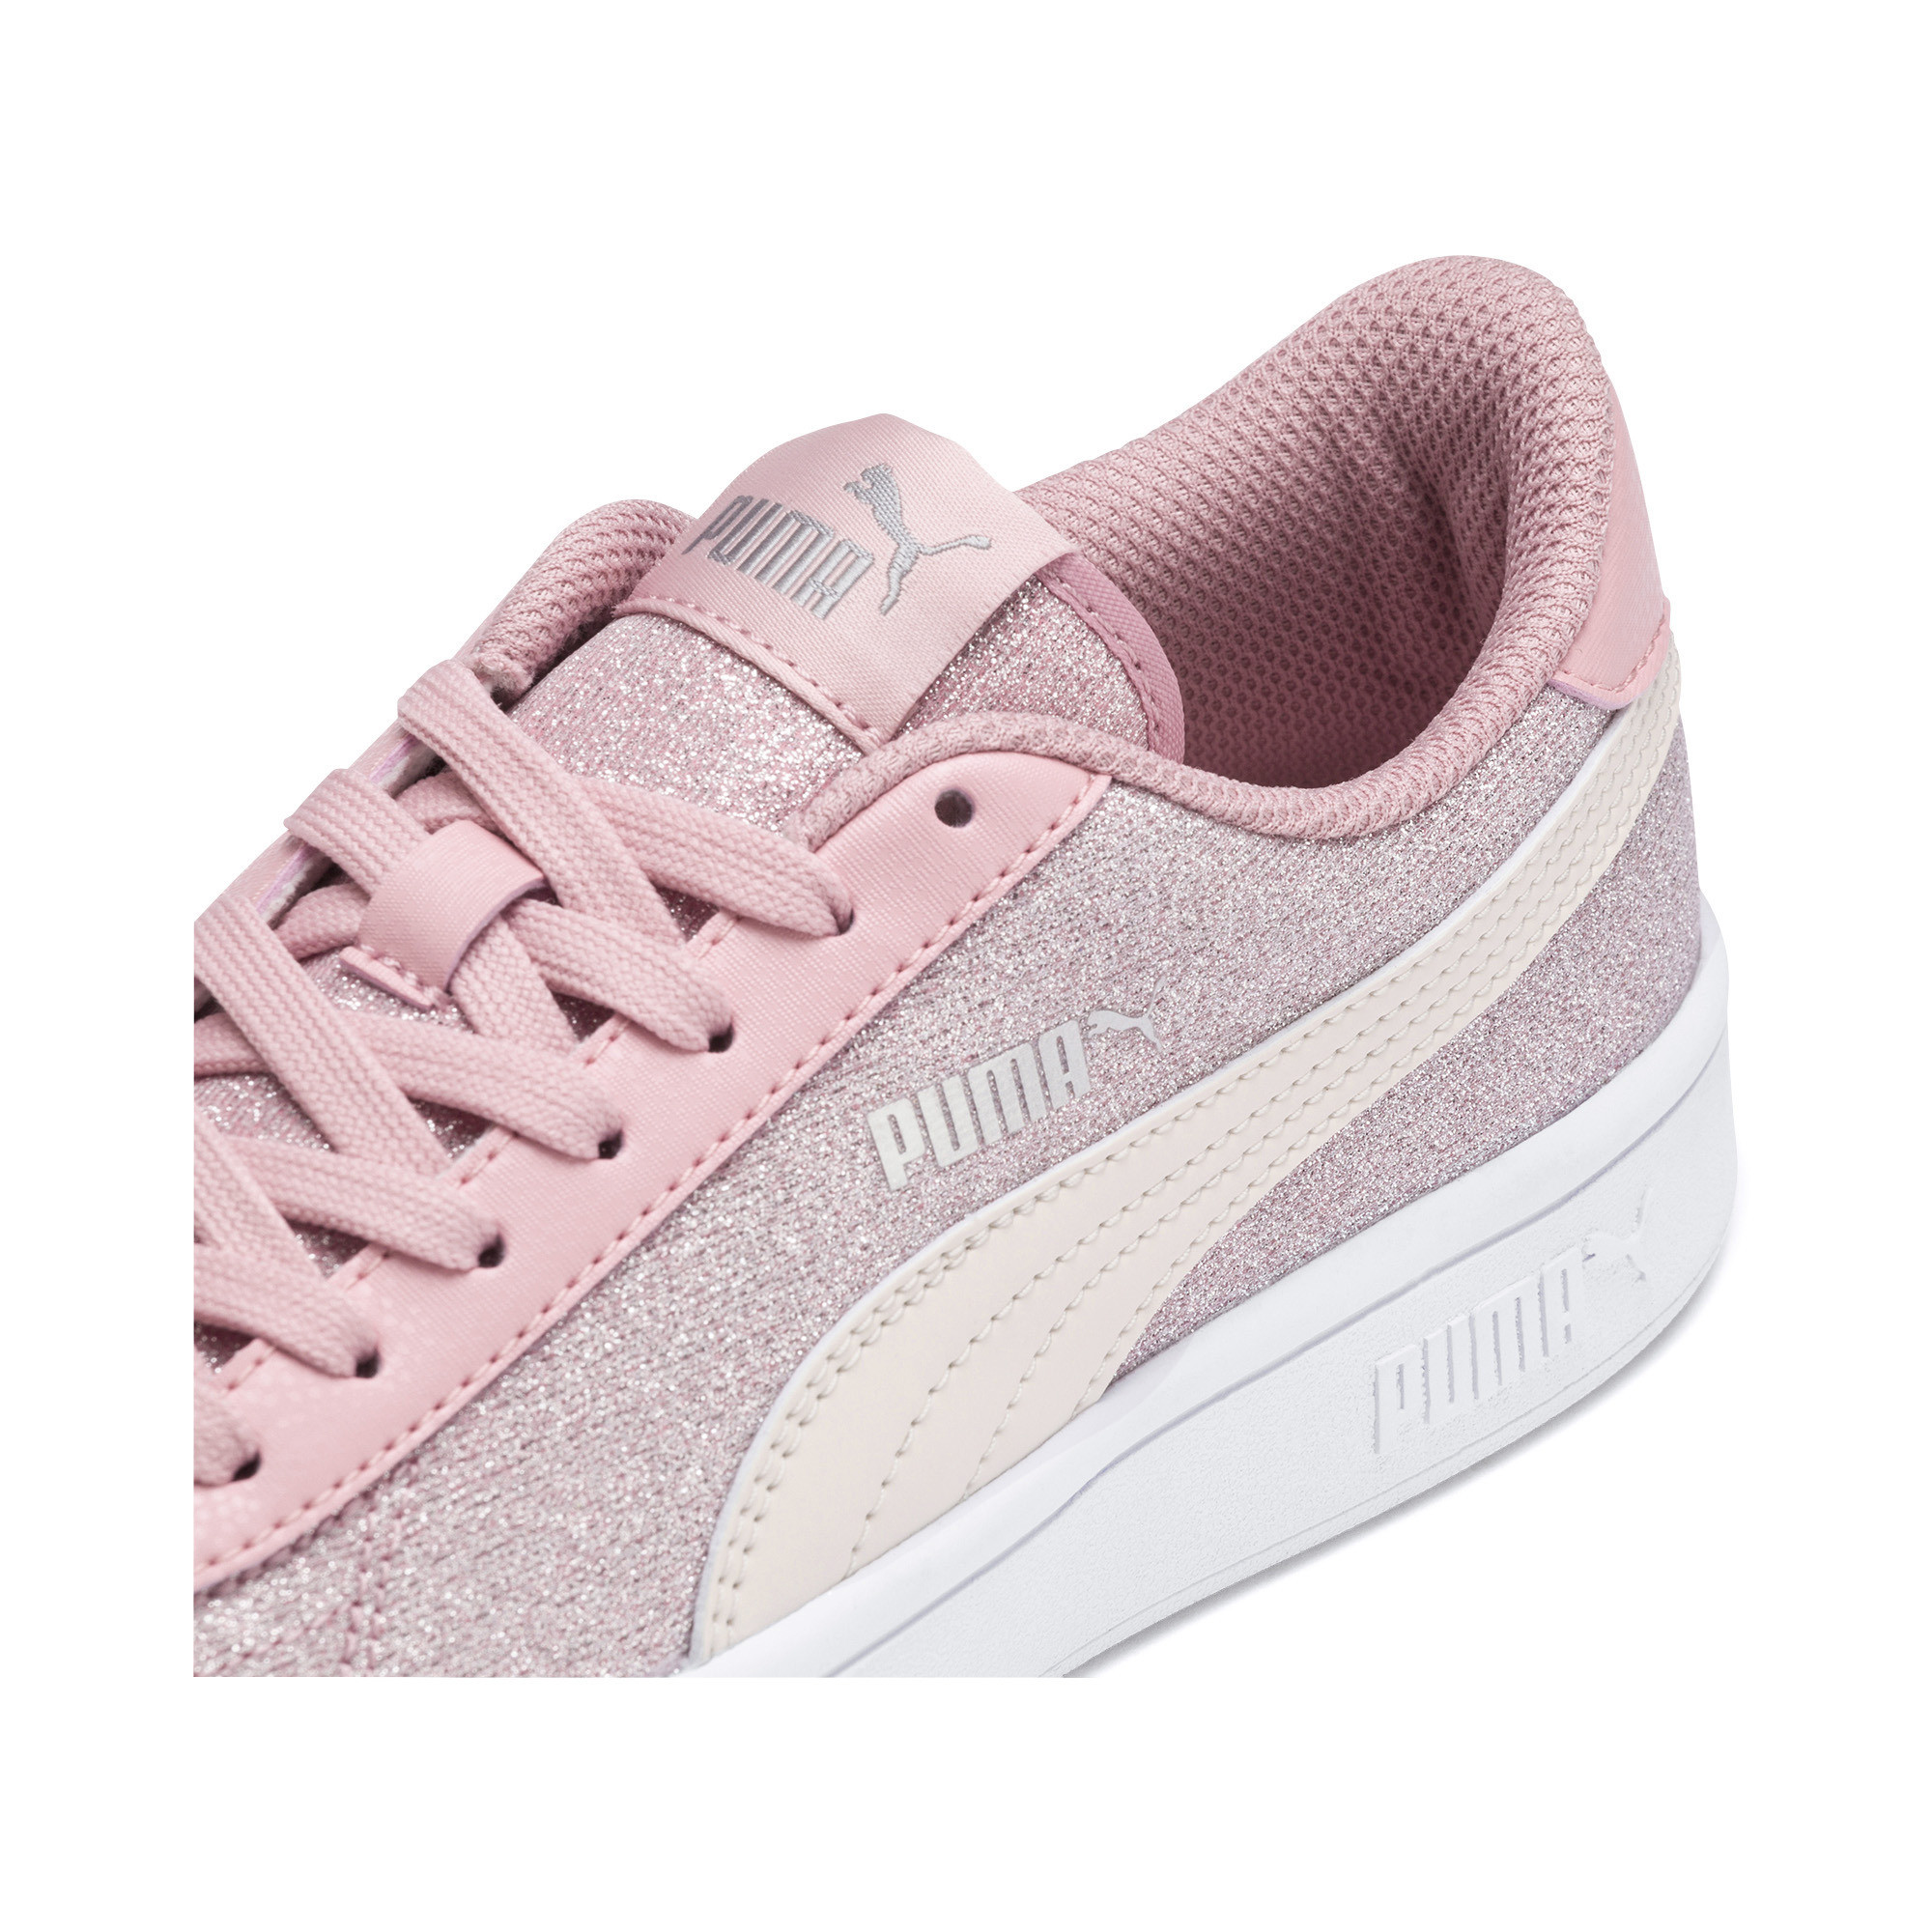 PUMA-Smash-v2-Glitz-Glam-Sneakers-JR-Girls-Shoe-Kids thumbnail 18